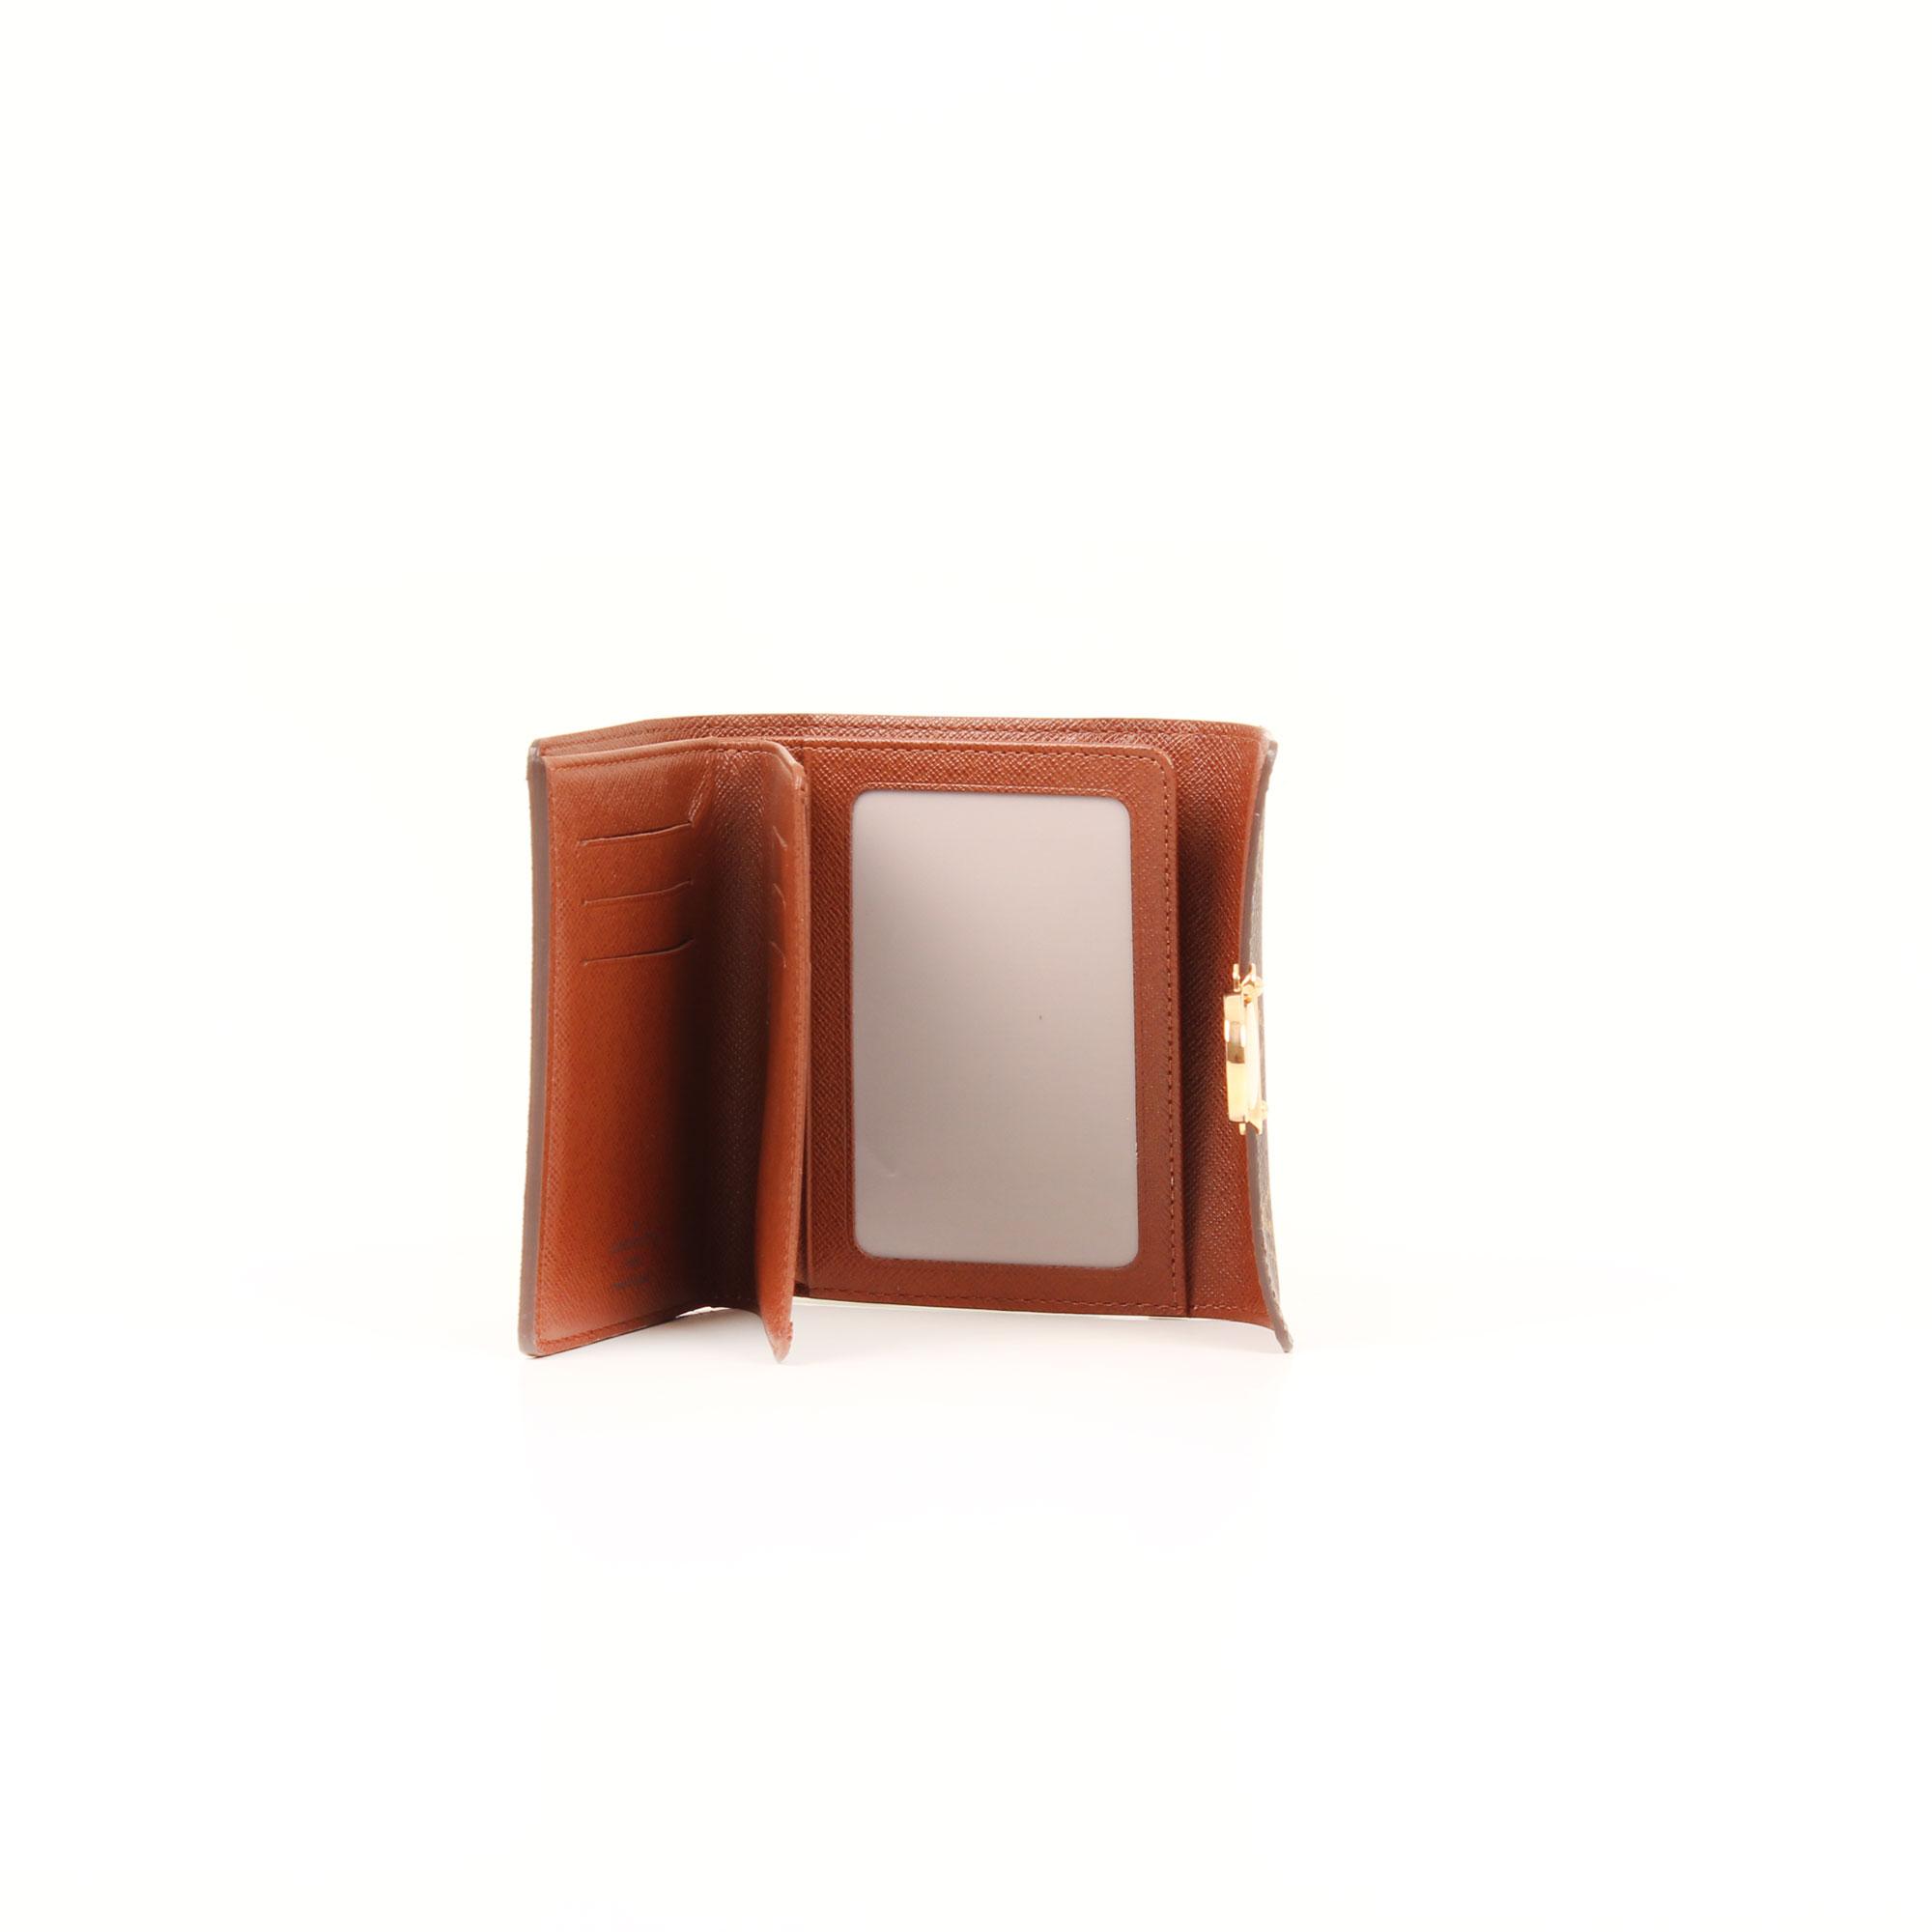 cartera-louis-vuitton-joey-monogram-interior2